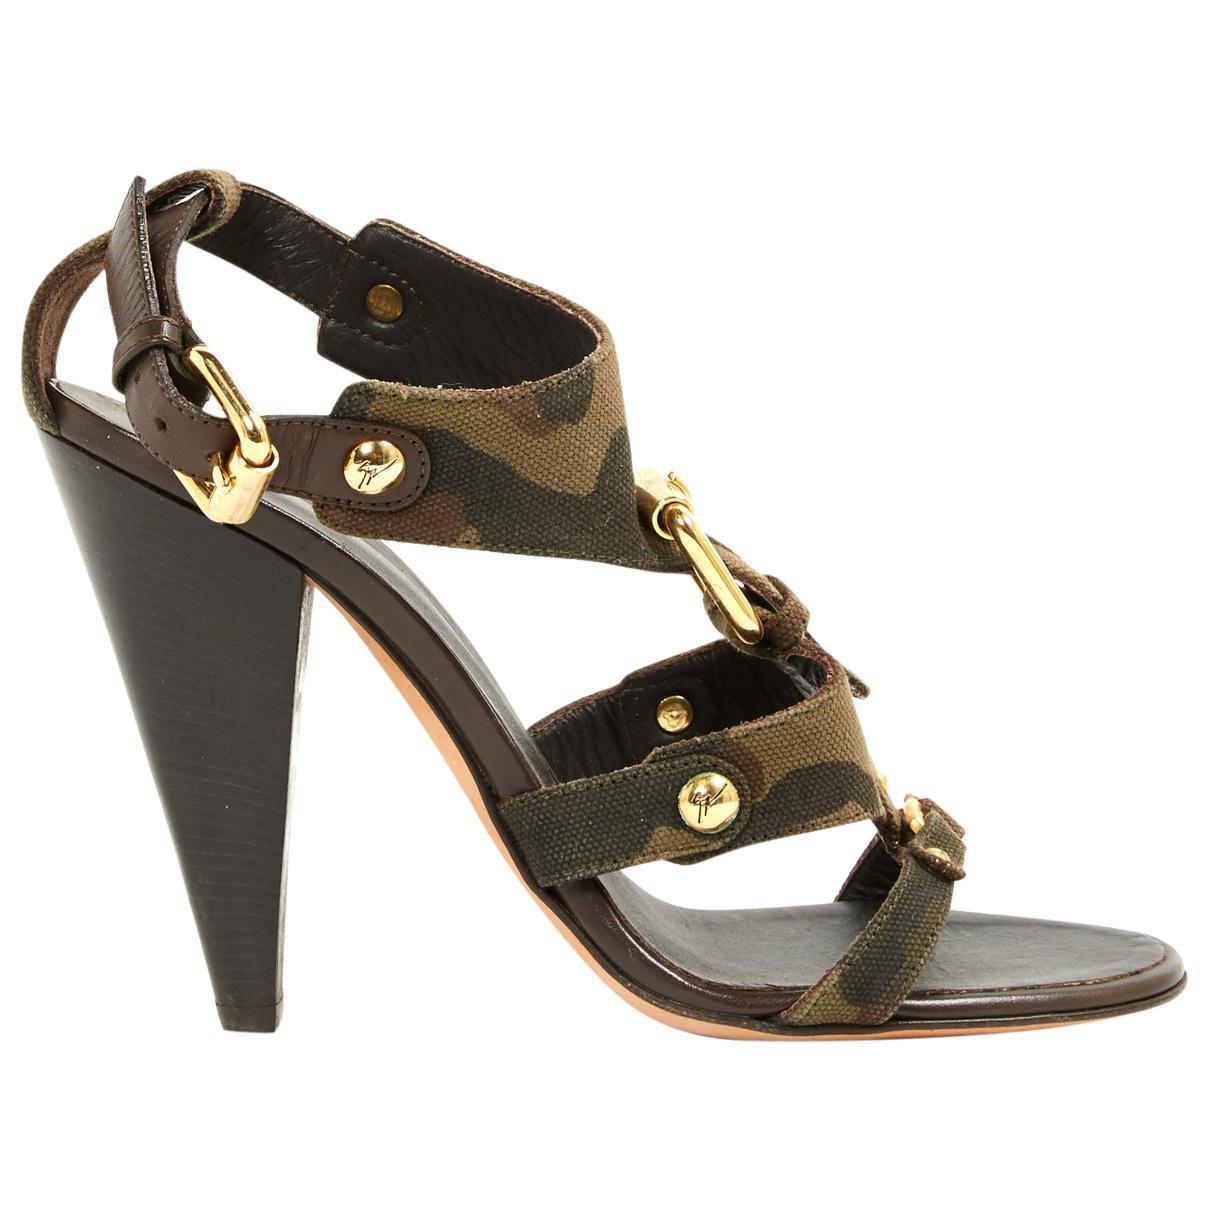 Pre-owned - Cloth sandals Giuseppe Zanotti rbTnTlQ